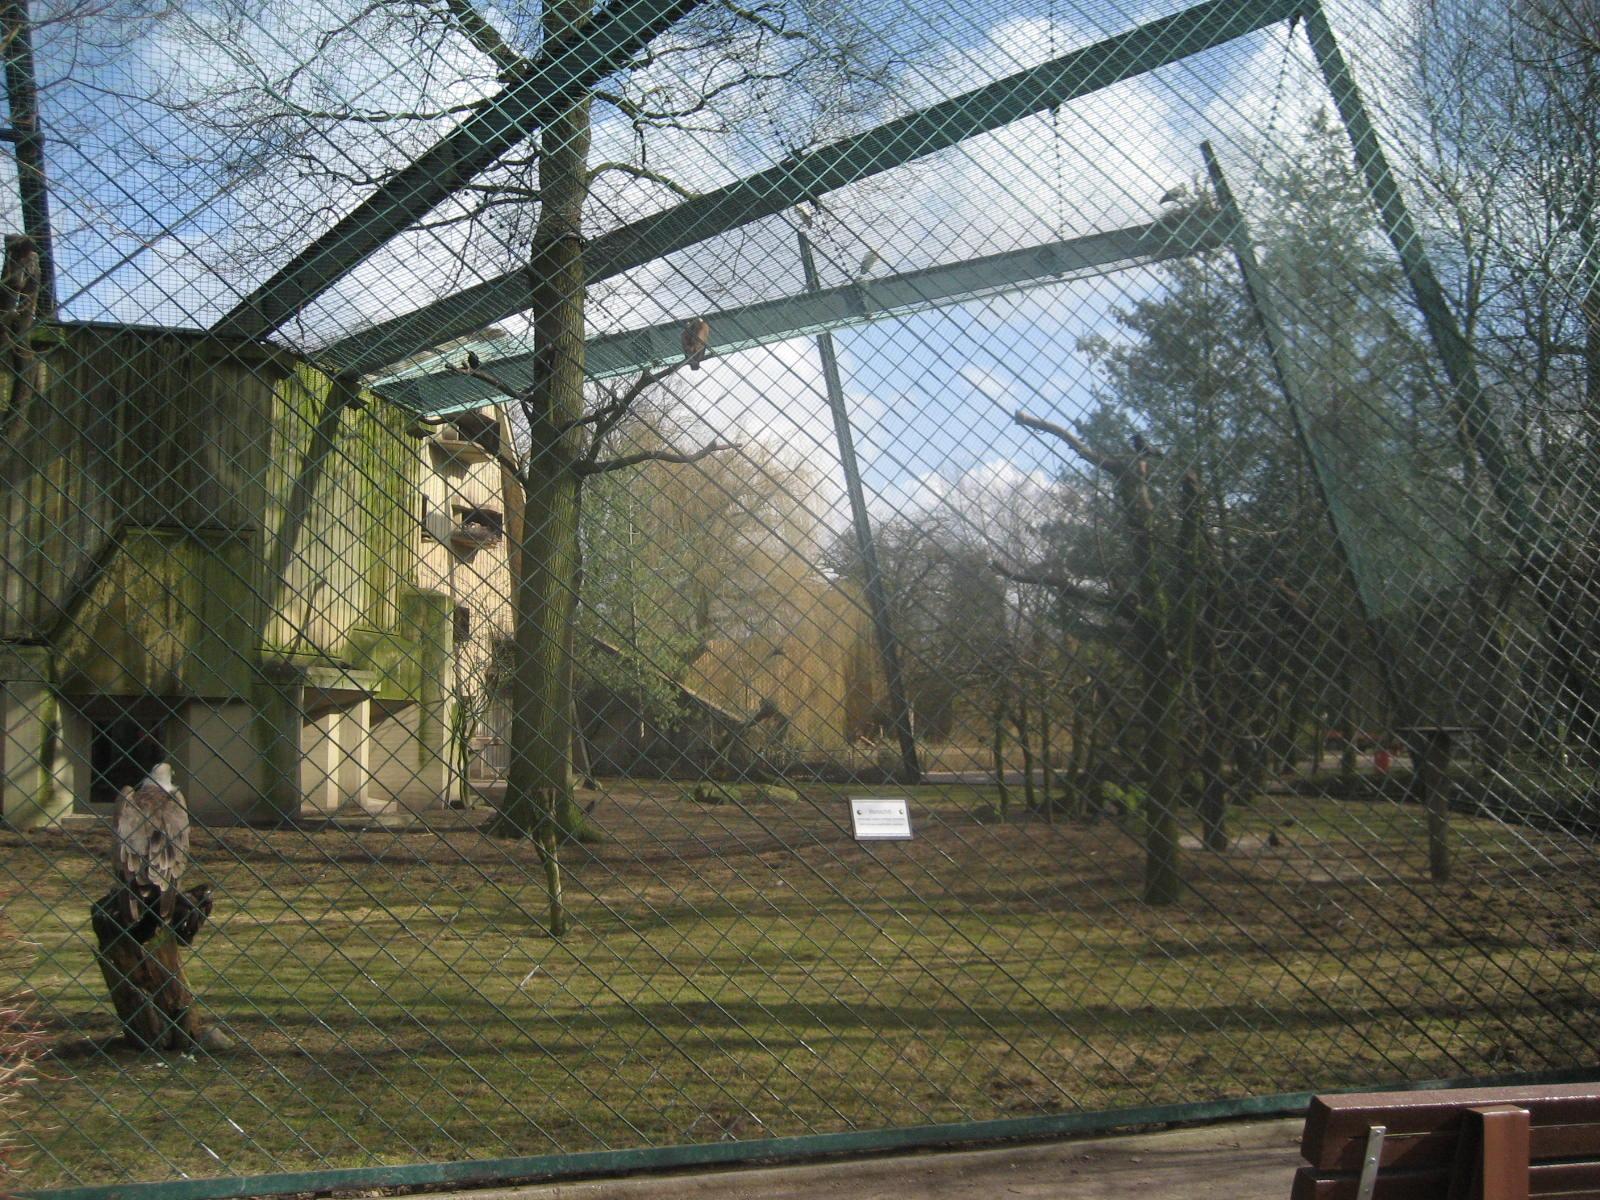 Allwetterzoo Munster - Geiervoliere  (4)